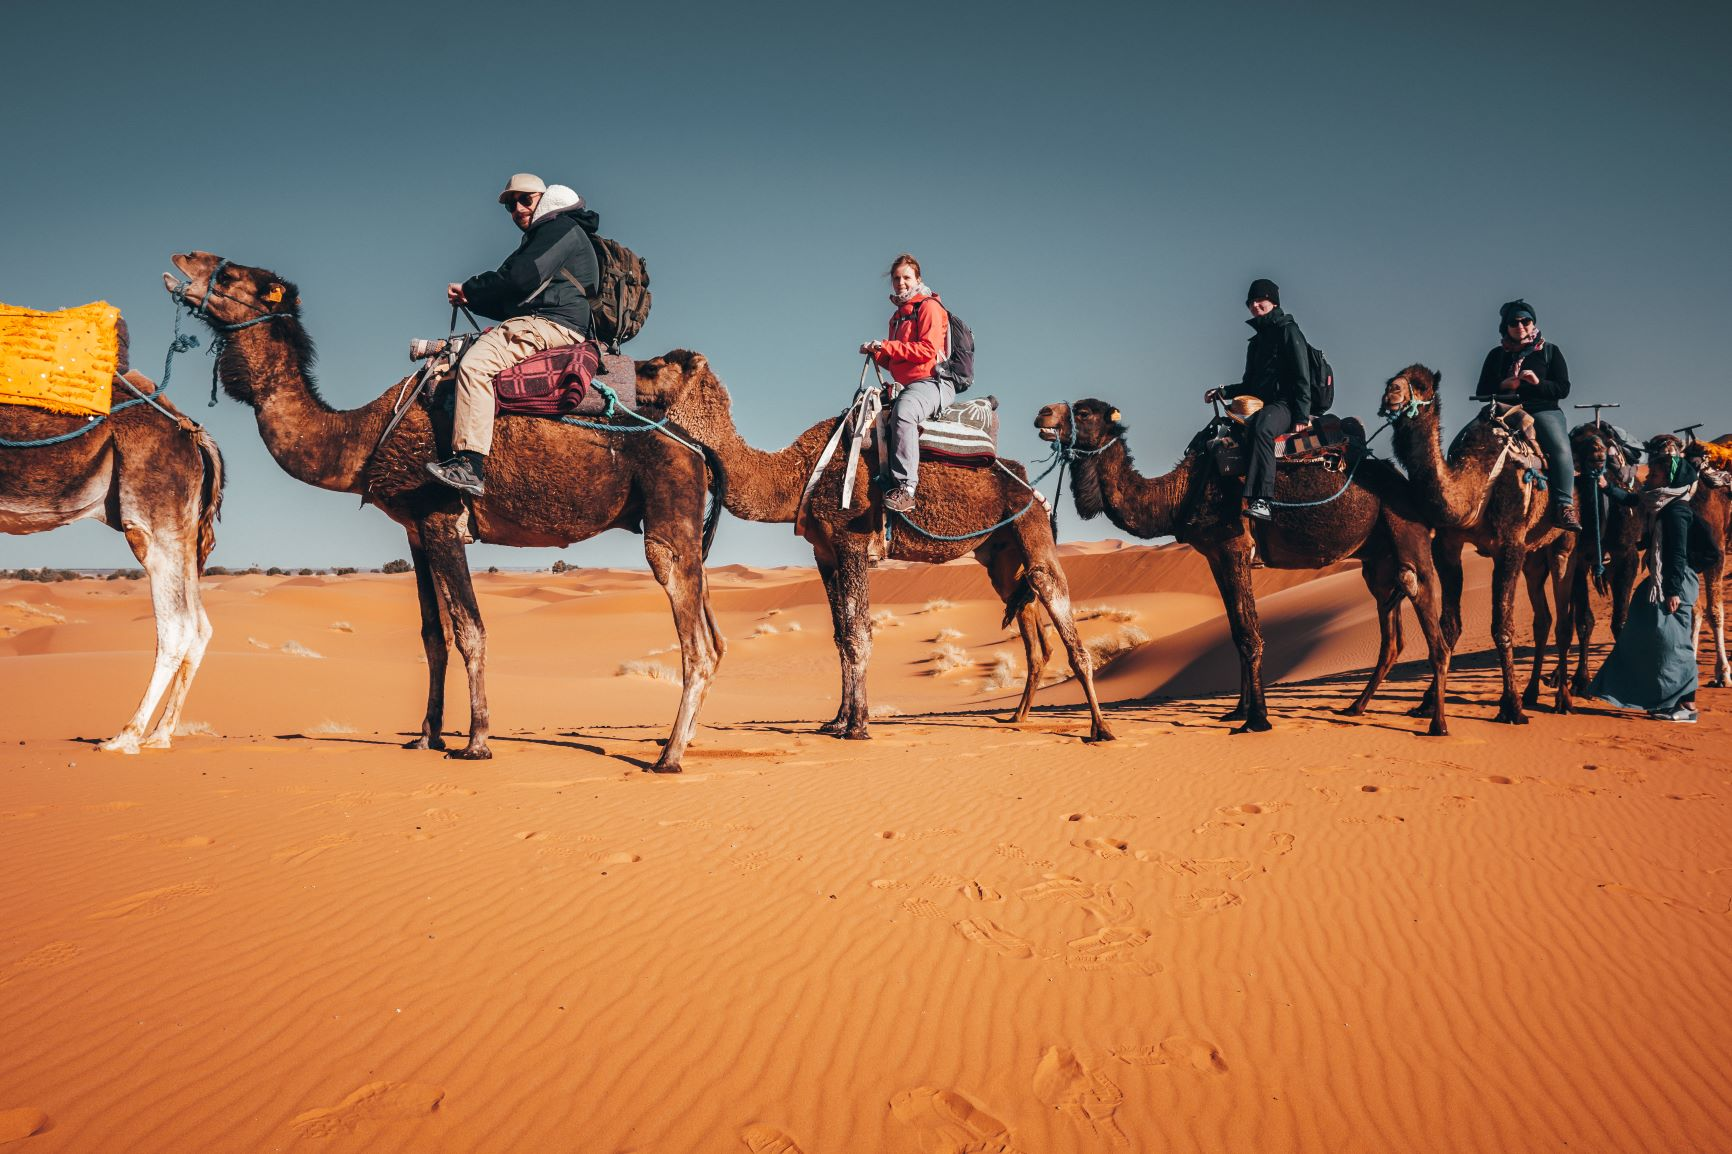 Marokko Reisen: Endlose Wüste